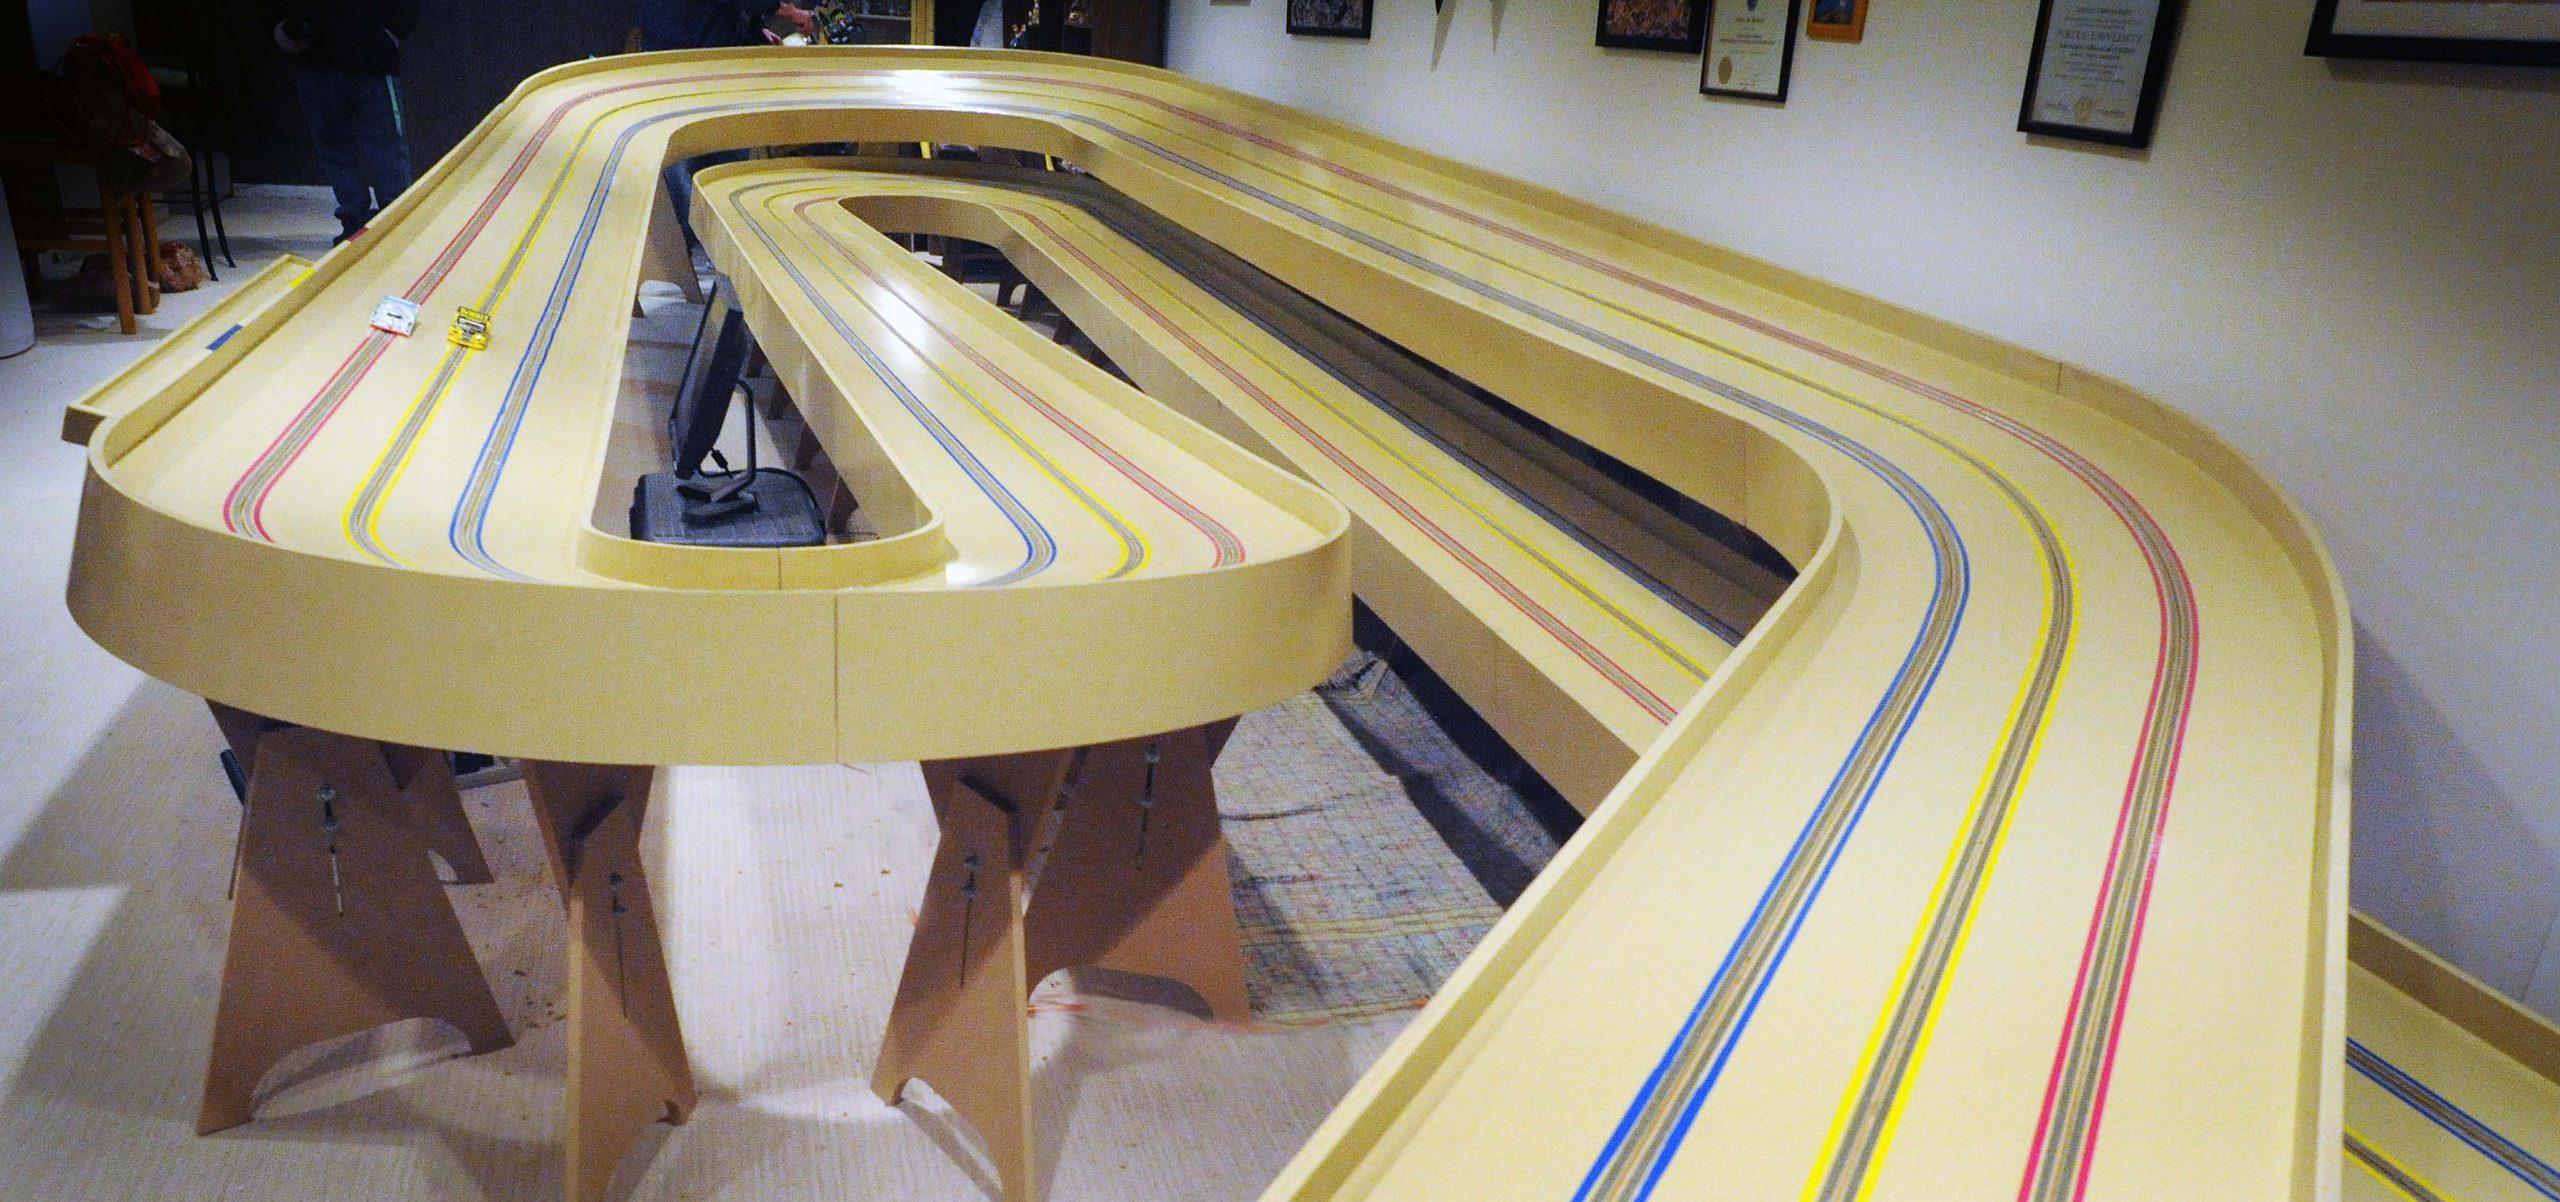 Topeka 4 lane home slot car track